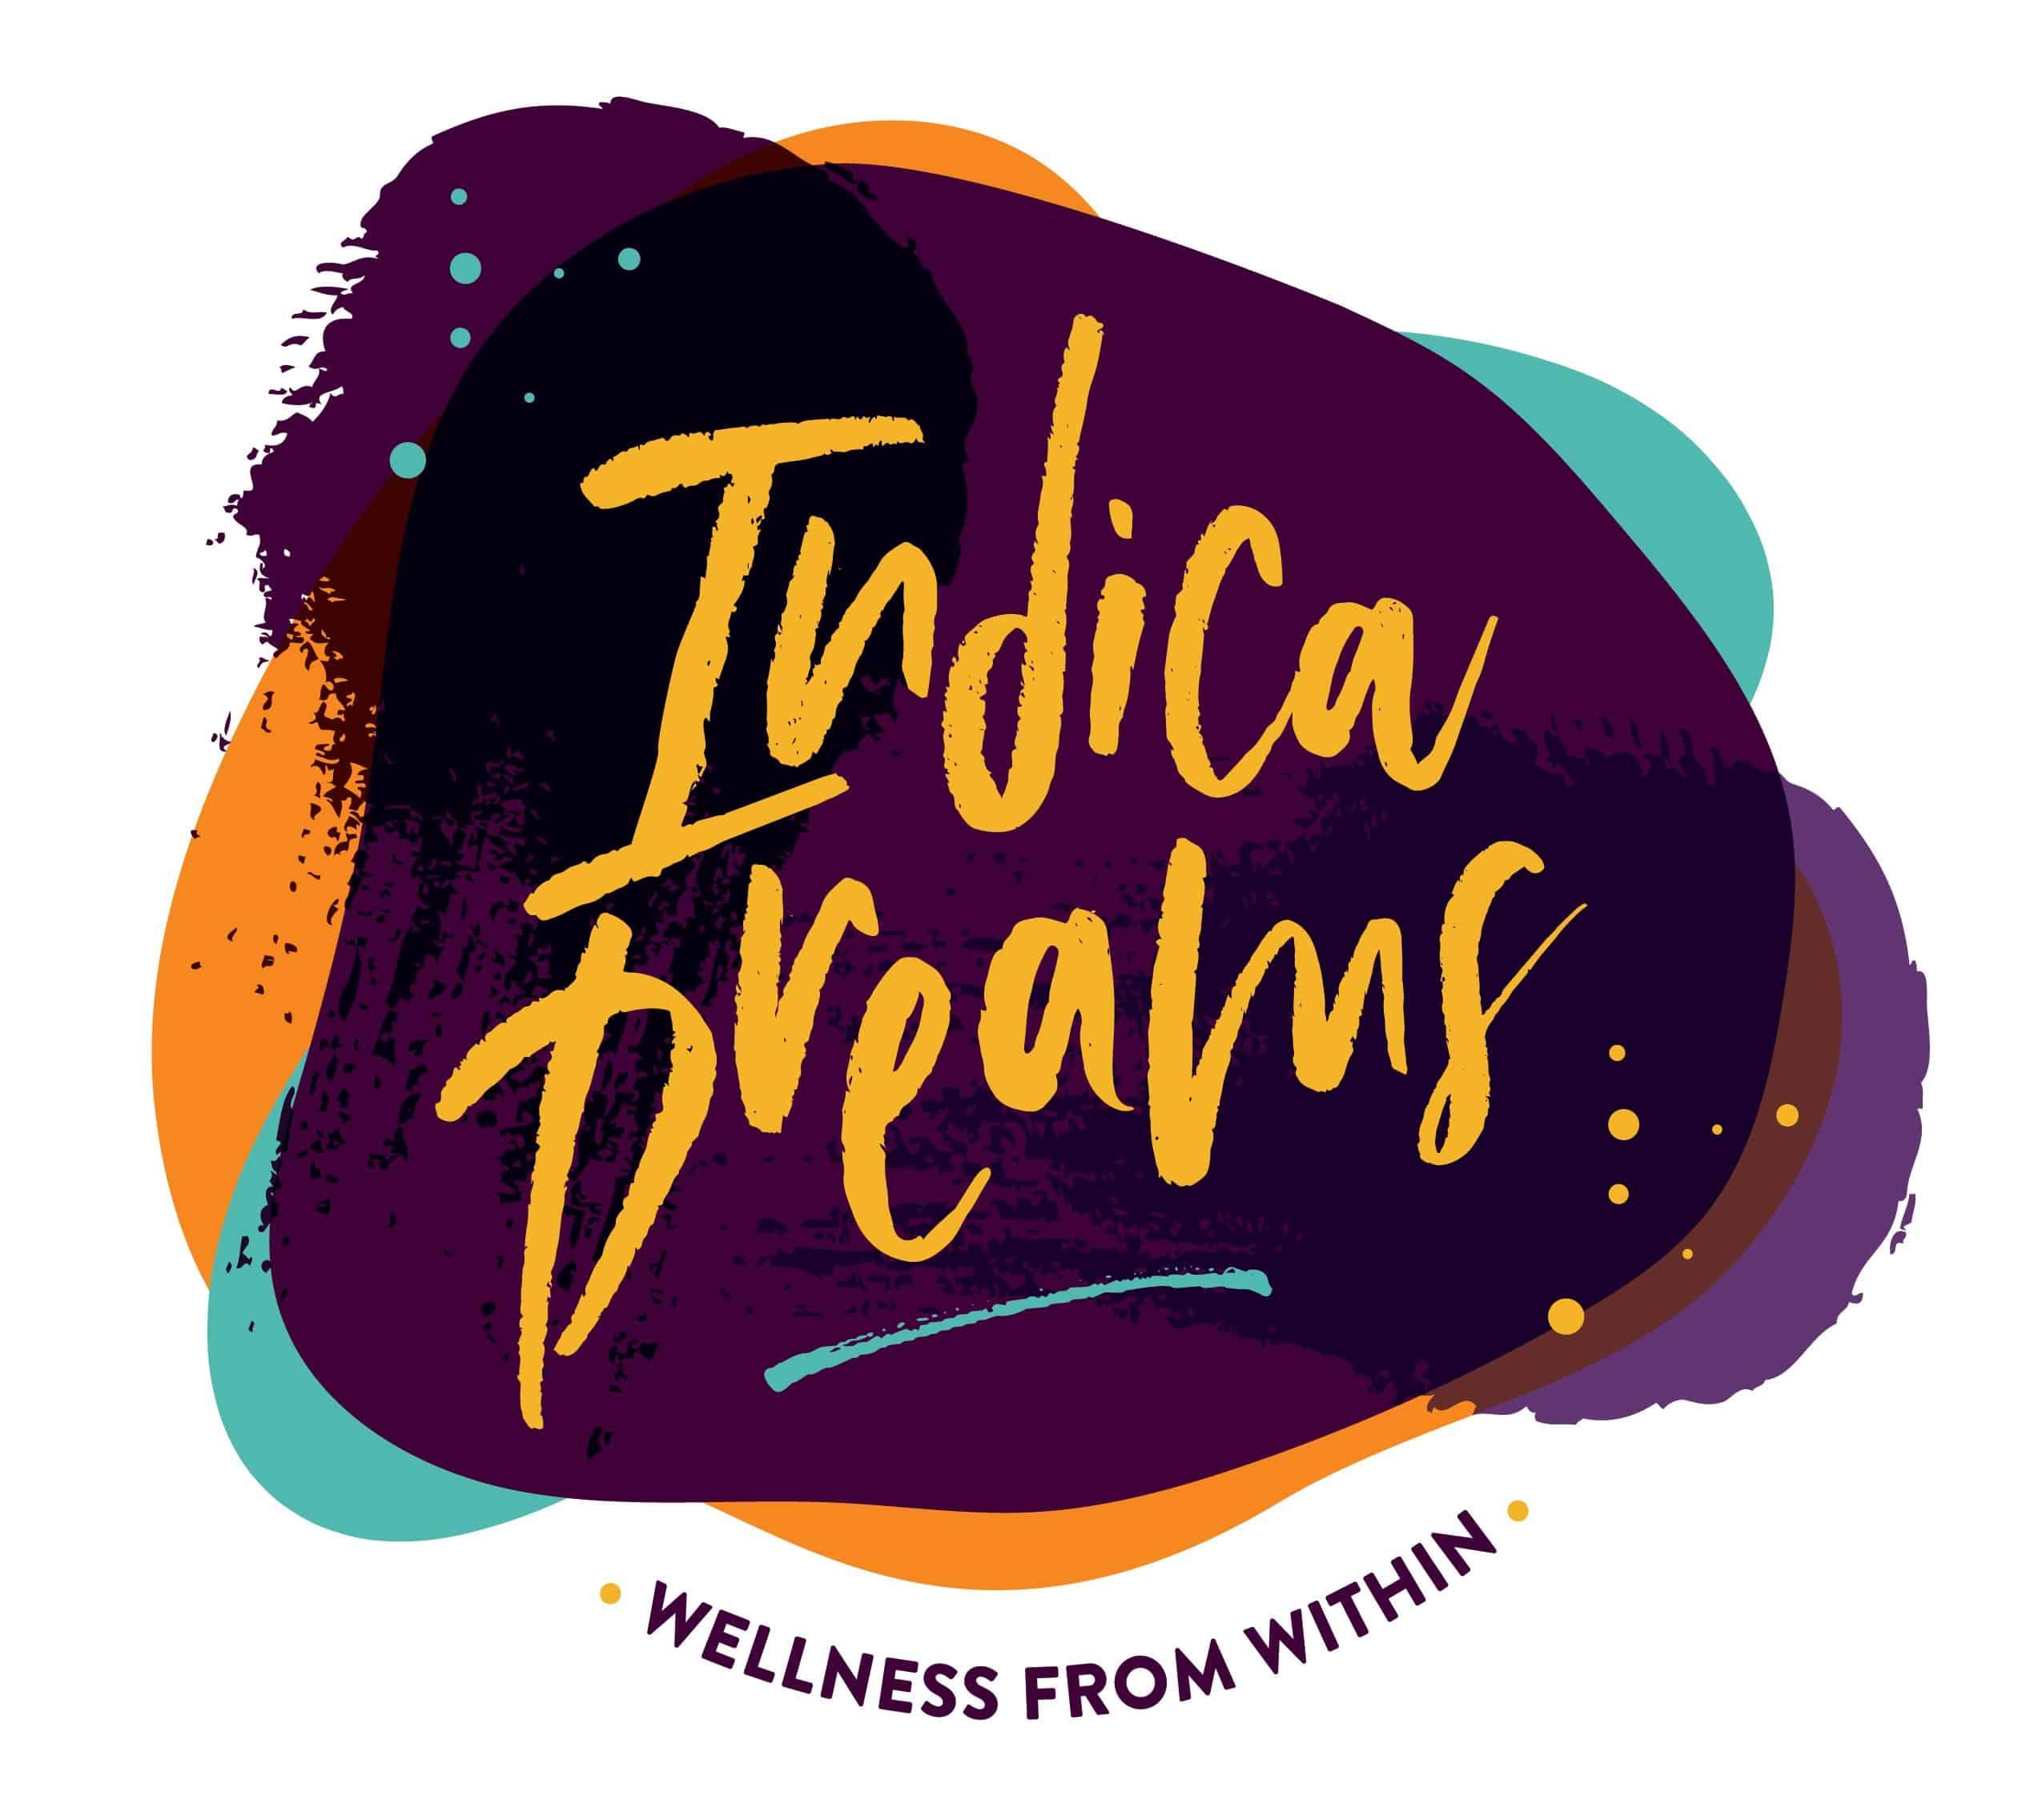 Indica Dreams CBD Coupon Code